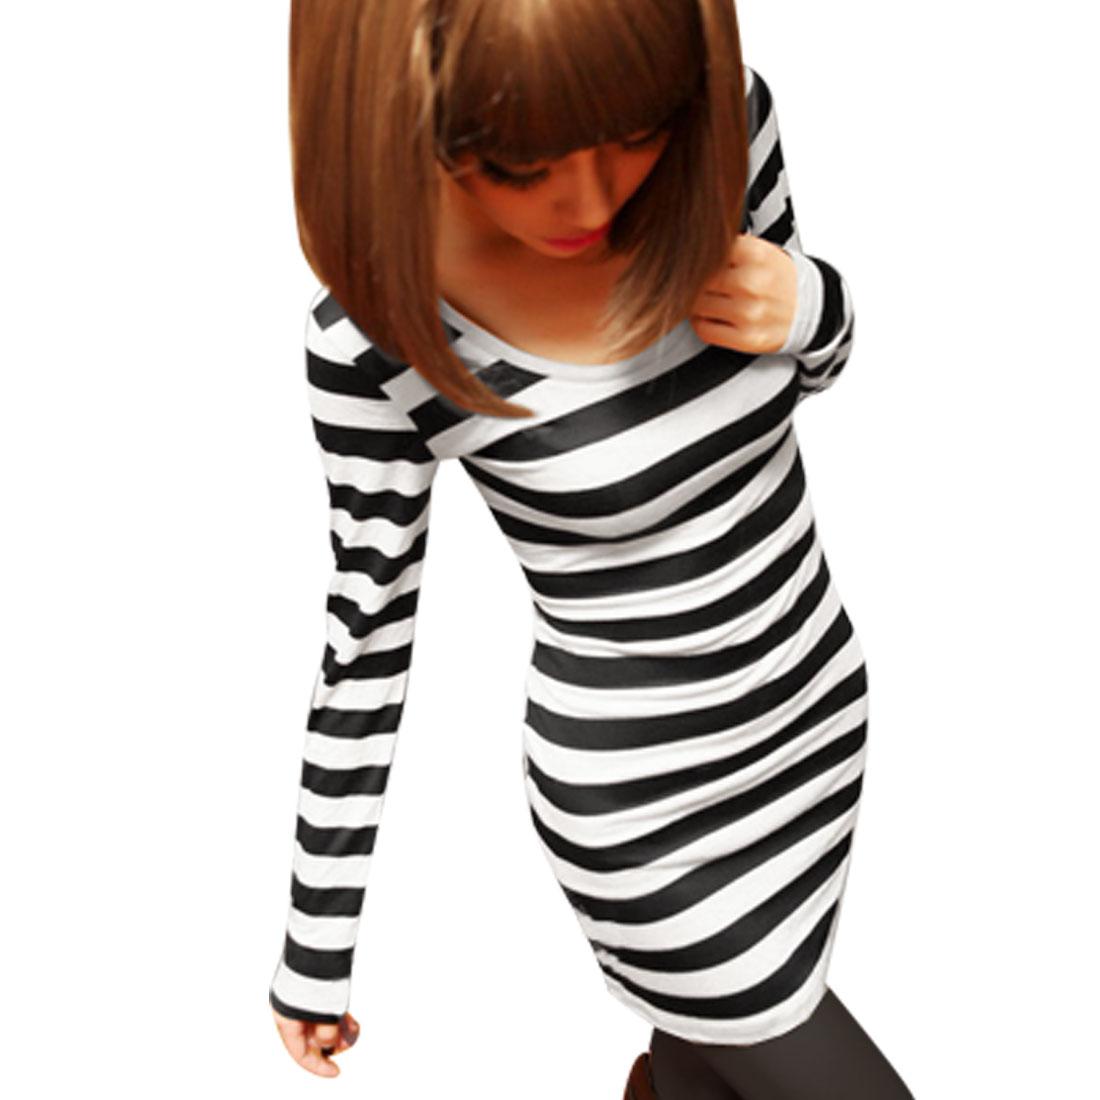 Ladies Black White Long Sleeve Stripes Close-fitting Tunic Shirt XL